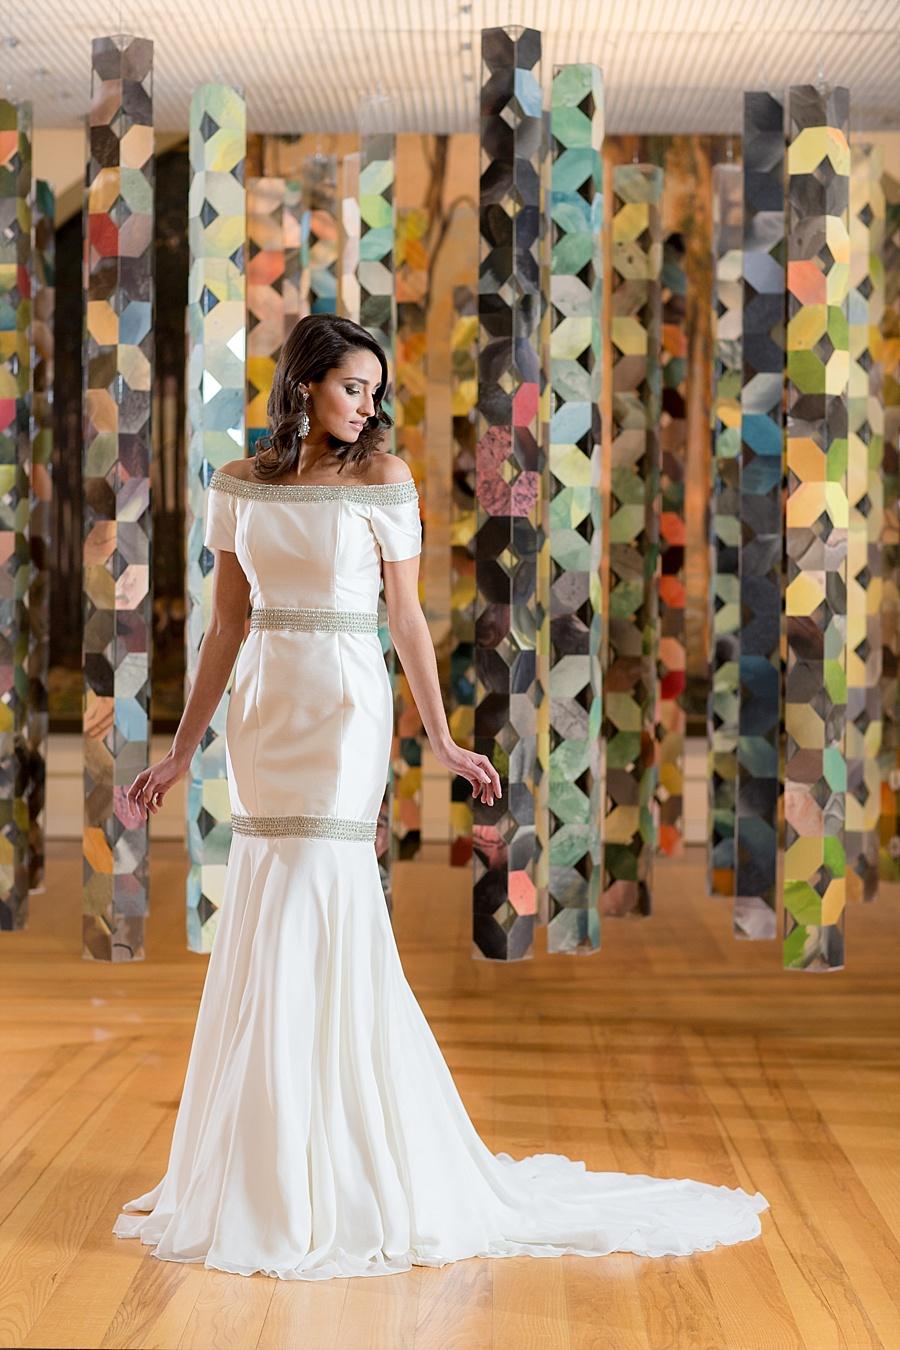 Vanessa_Joy_Photography_Details_of_I_do_Jean_Ralph_Thurin_Wedding_Gowns_April_Lynn_Designs_Wedding_Stationery2